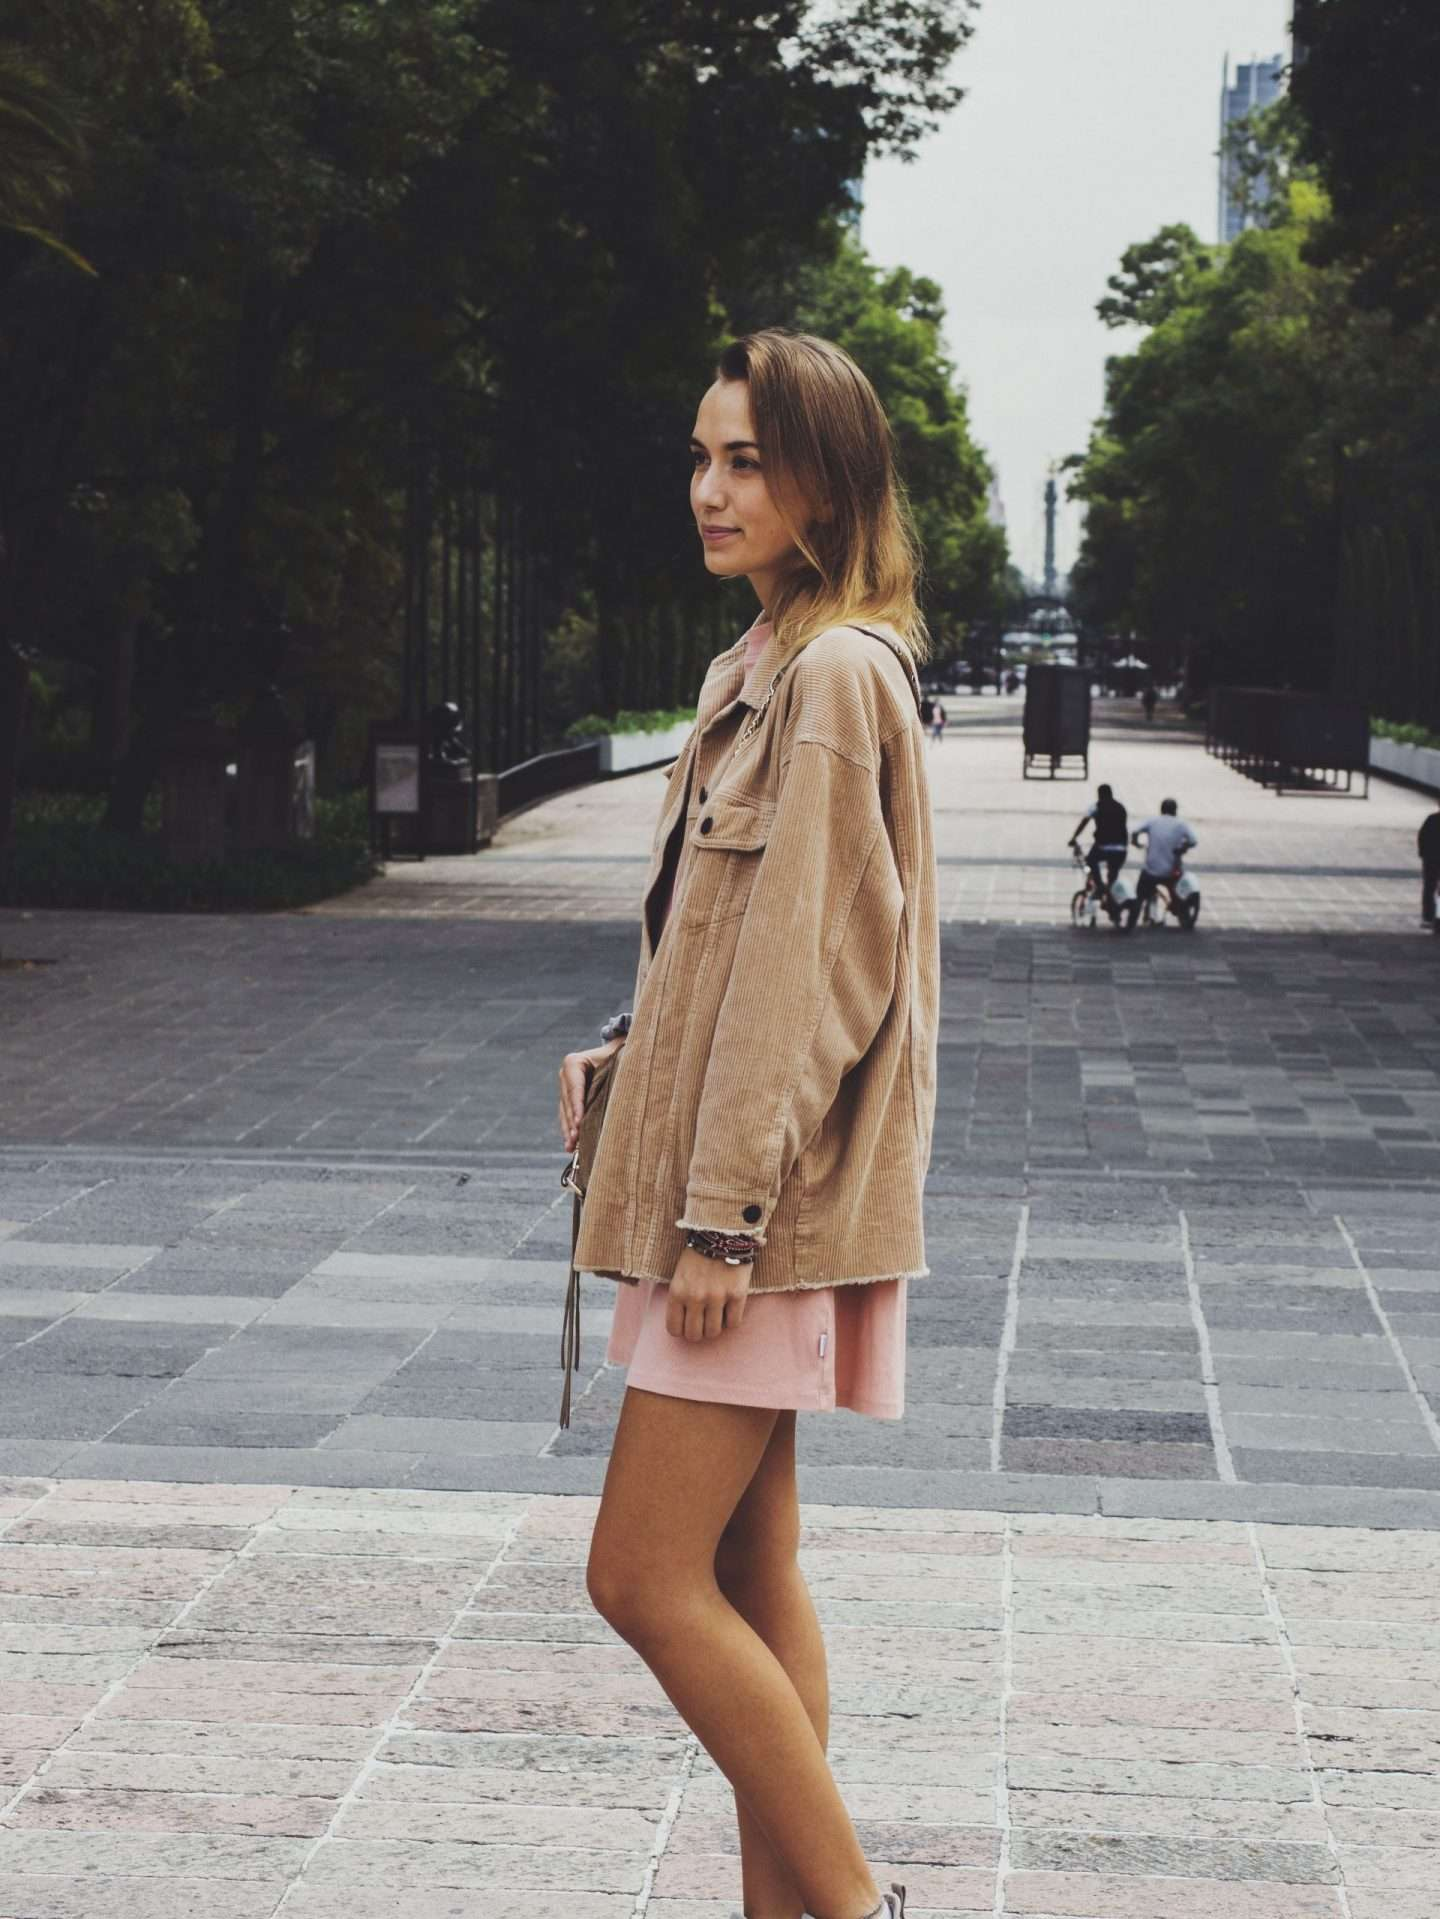 Herbstanfang – Die perfekte Kleidung für den Übergang